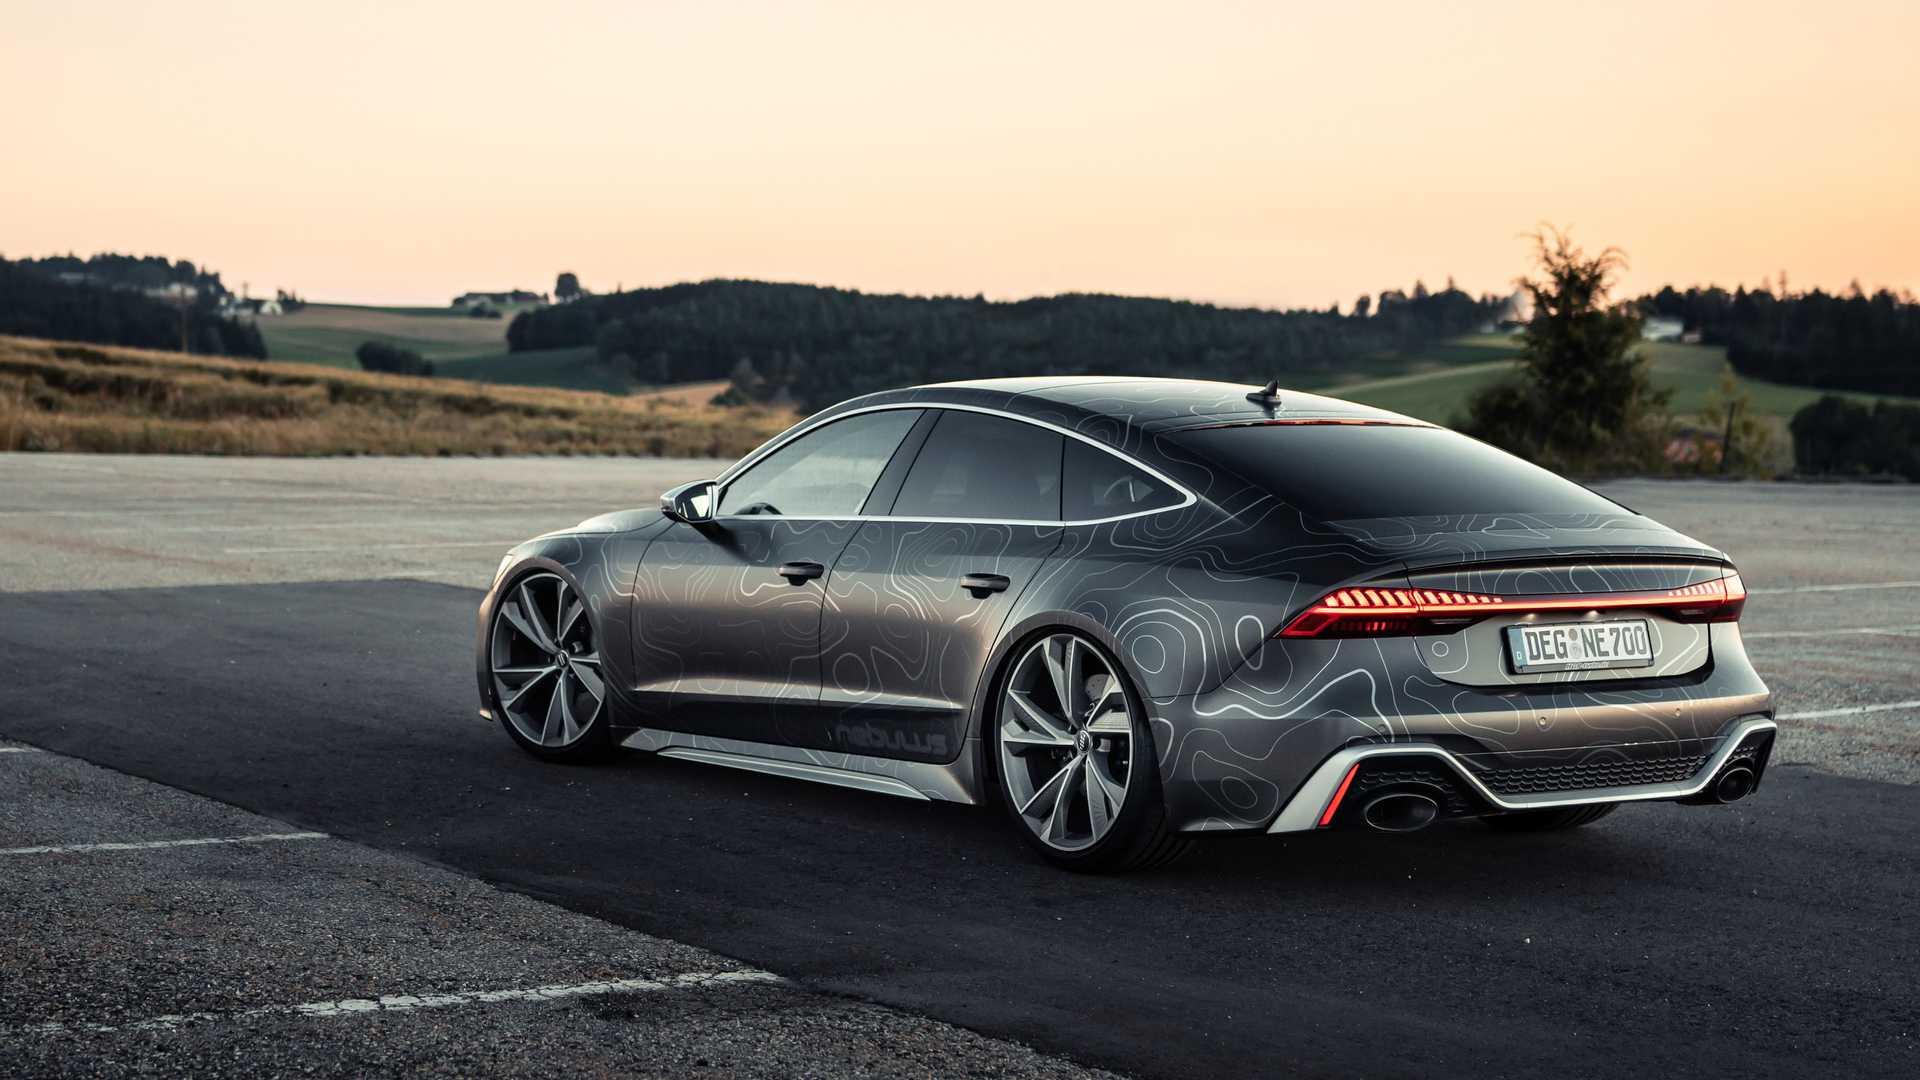 Audi-RS7-By-Black-Box-Richter-8